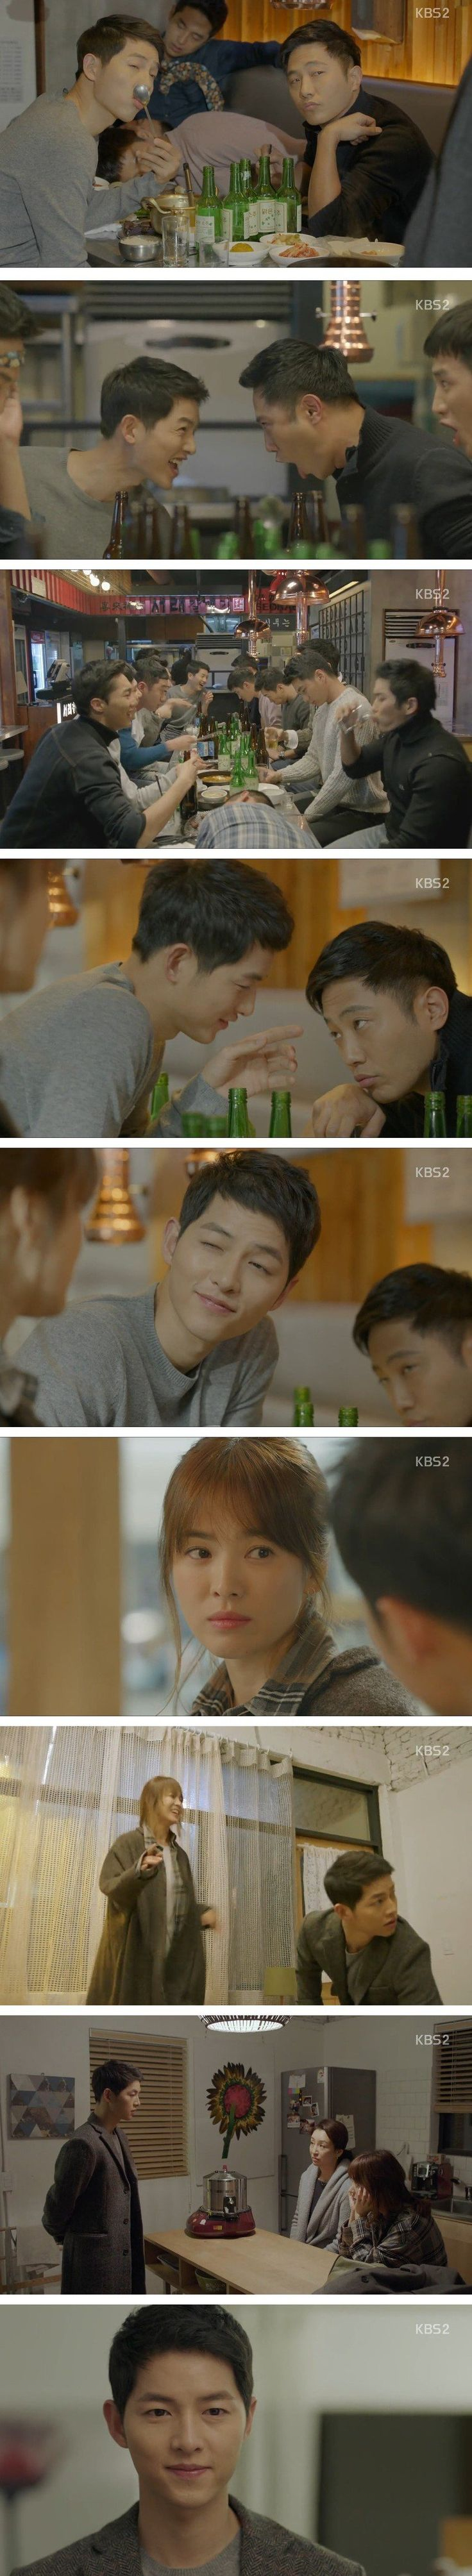 Descendants of the Sun (태양의 후예) Korean - Drama - Episode 13 - Picture @ HanCinema :: The Korean Movie and Drama Database